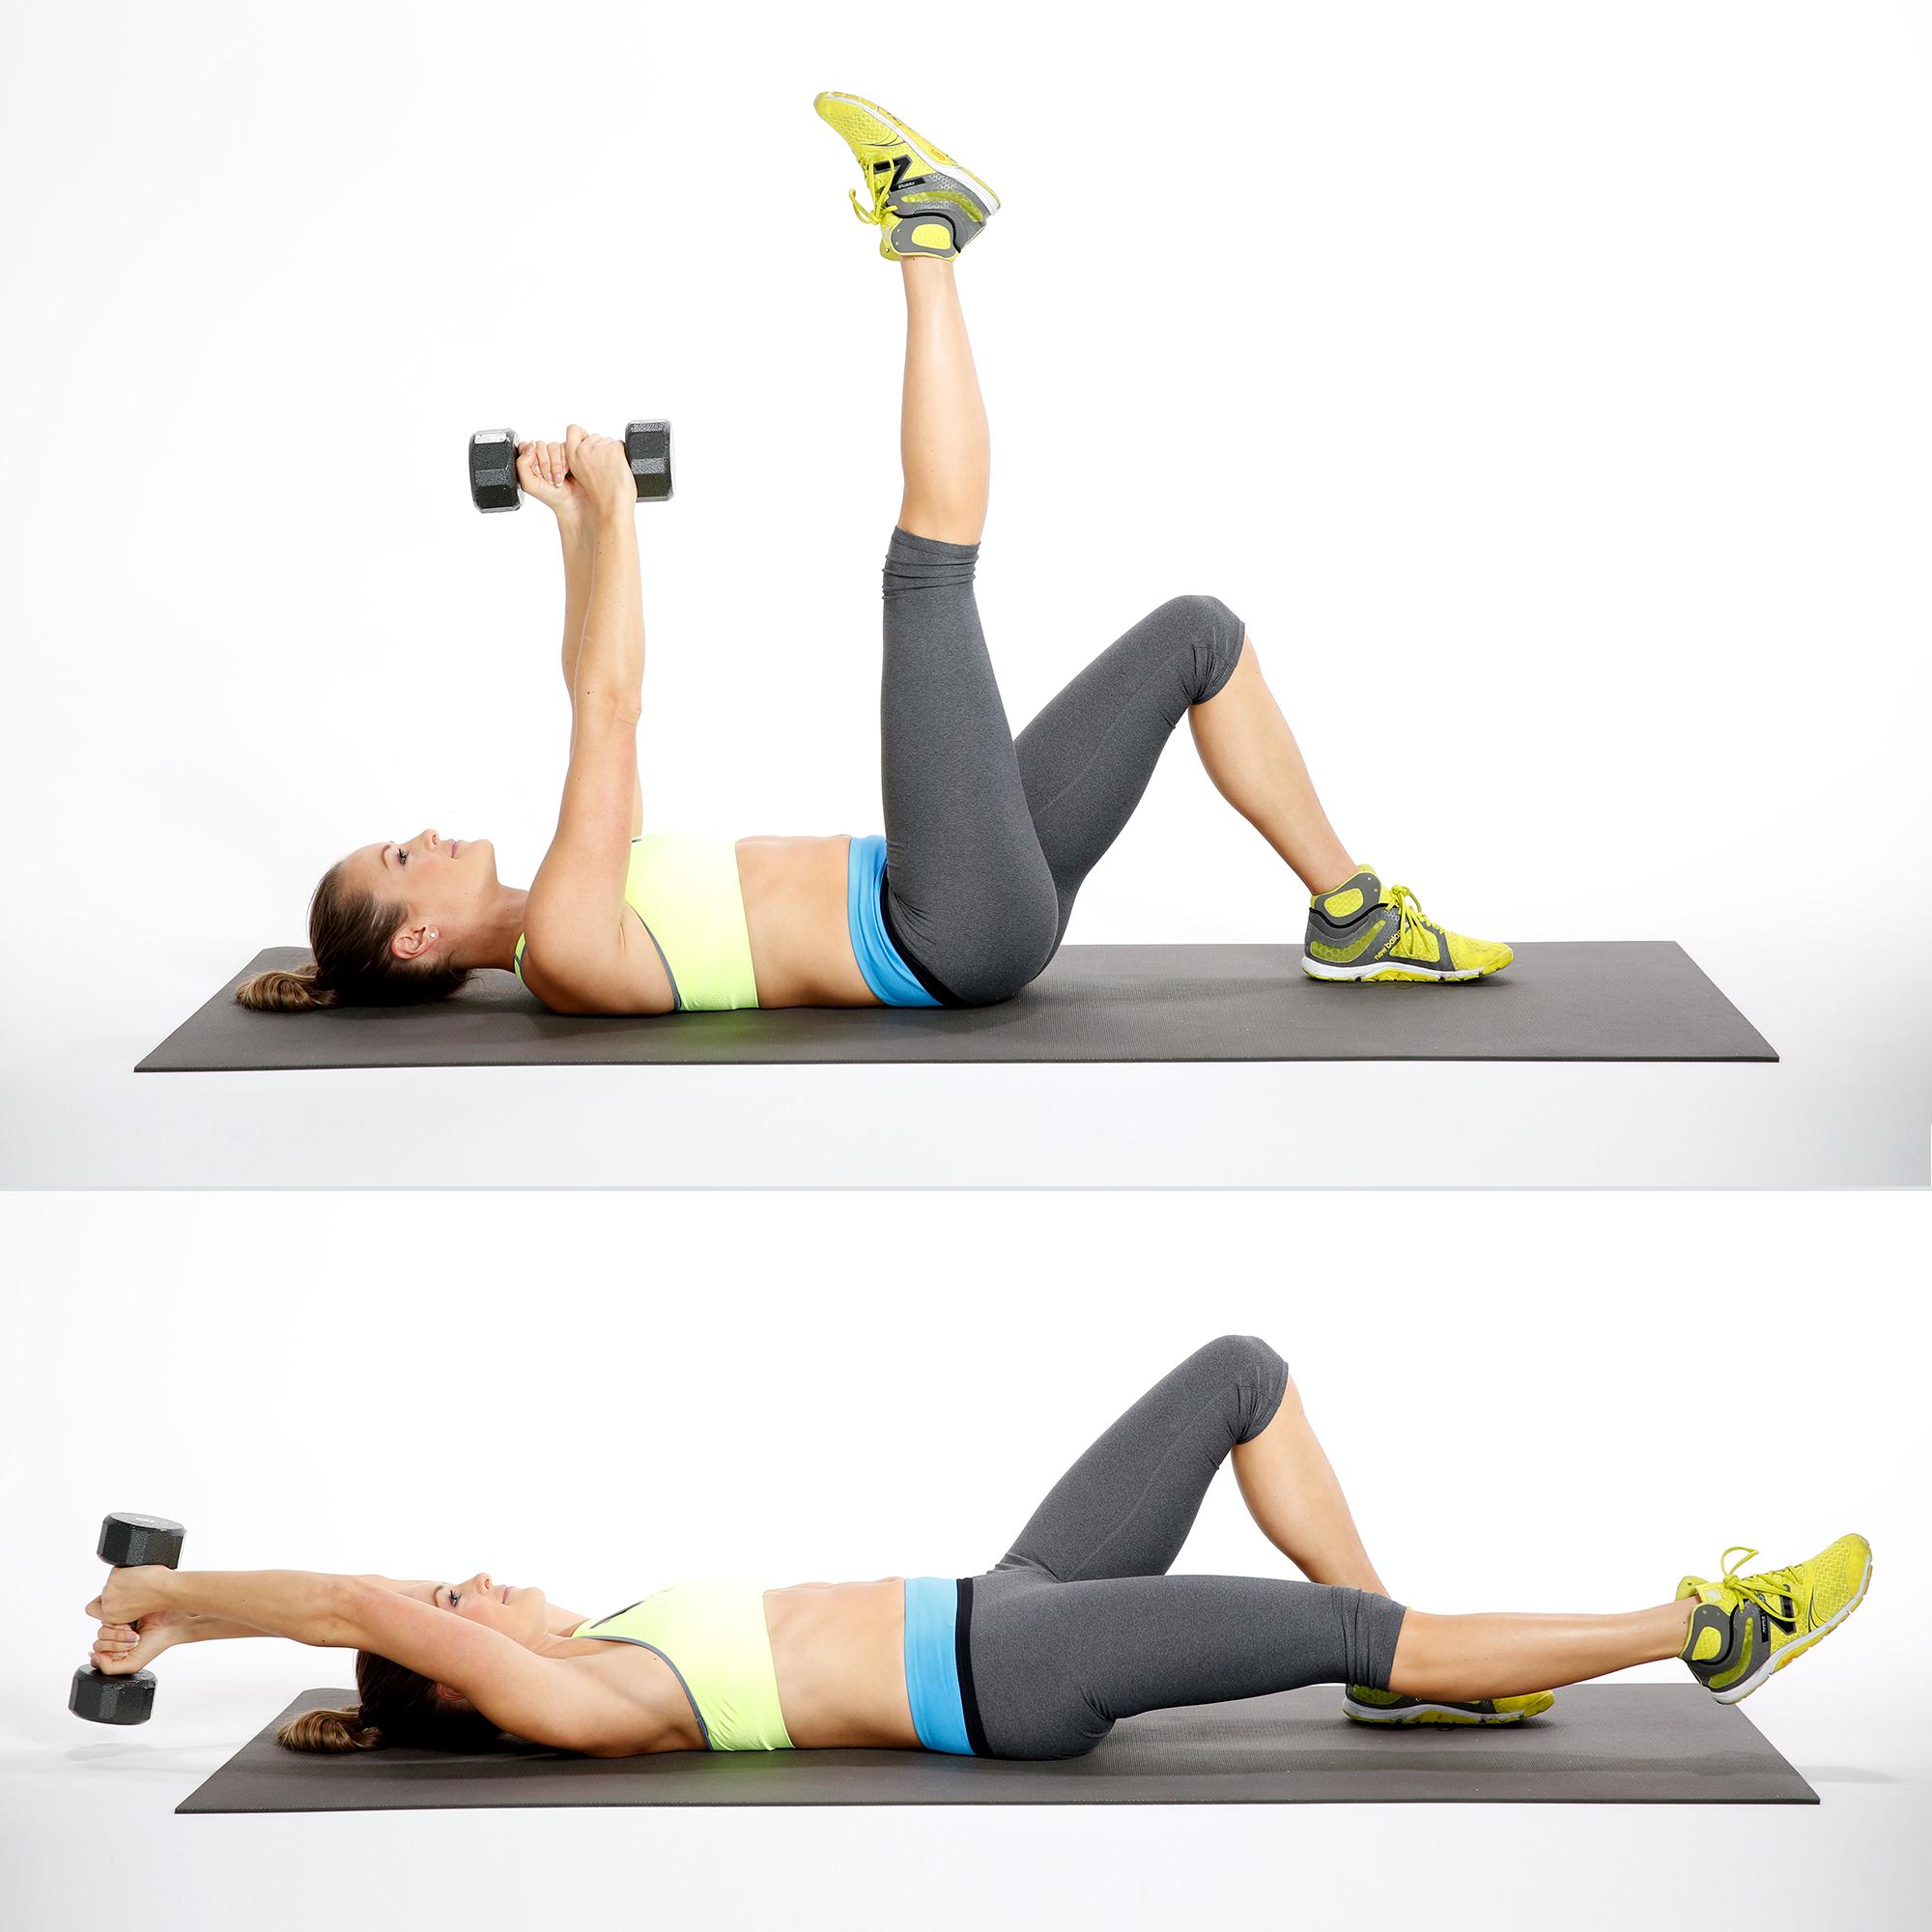 Circuit Three: Overhead Reach With Leg Lower